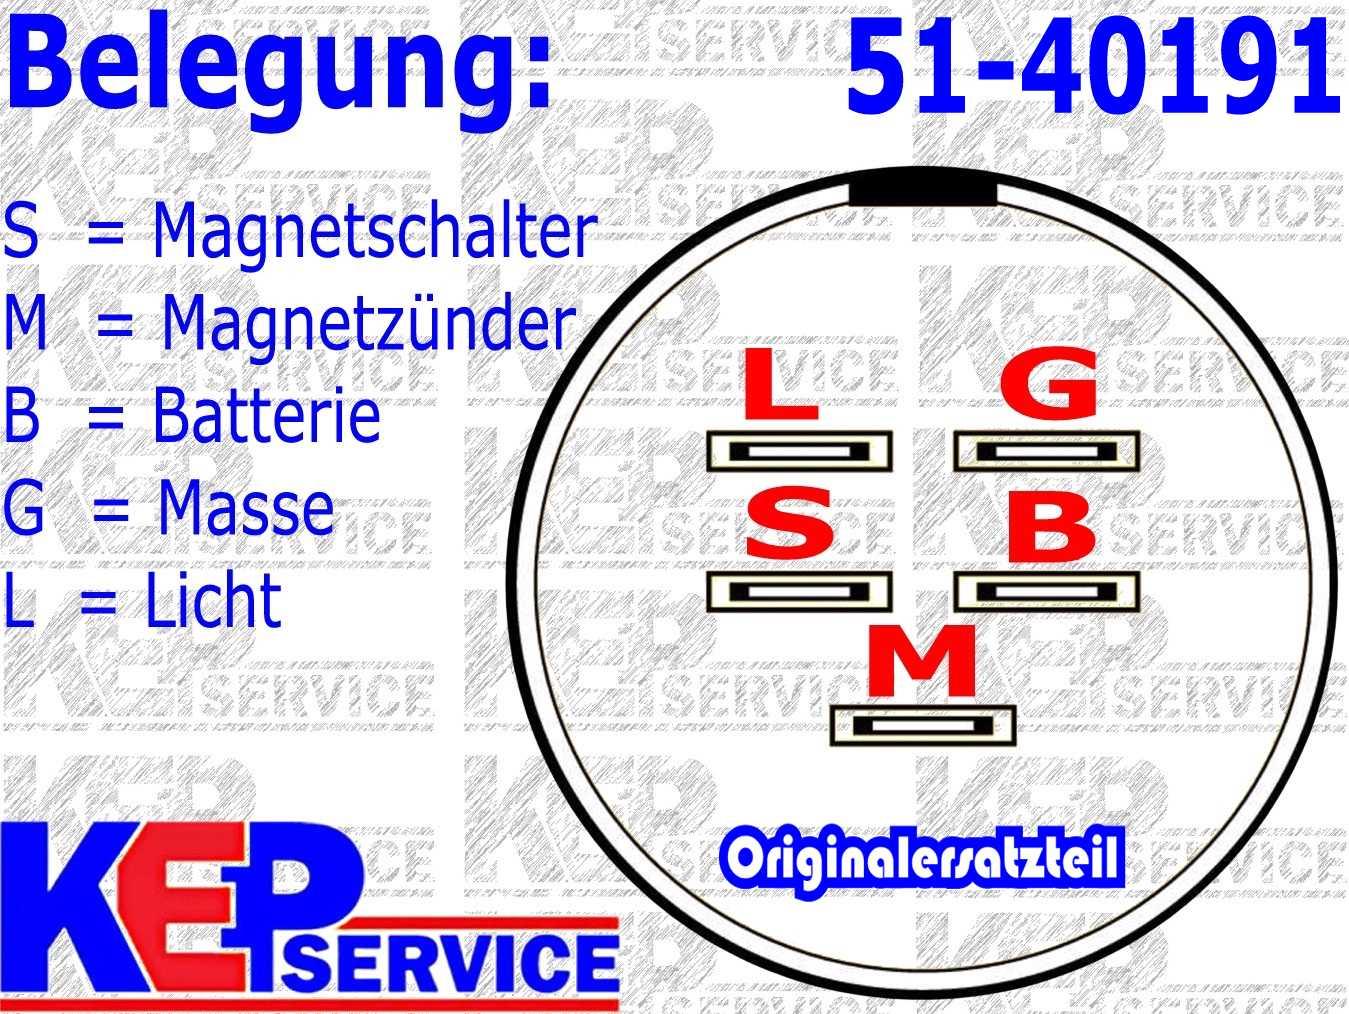 Großzügig 1968 Mustang Zündschalter Schaltplan Galerie - Schaltplan ...